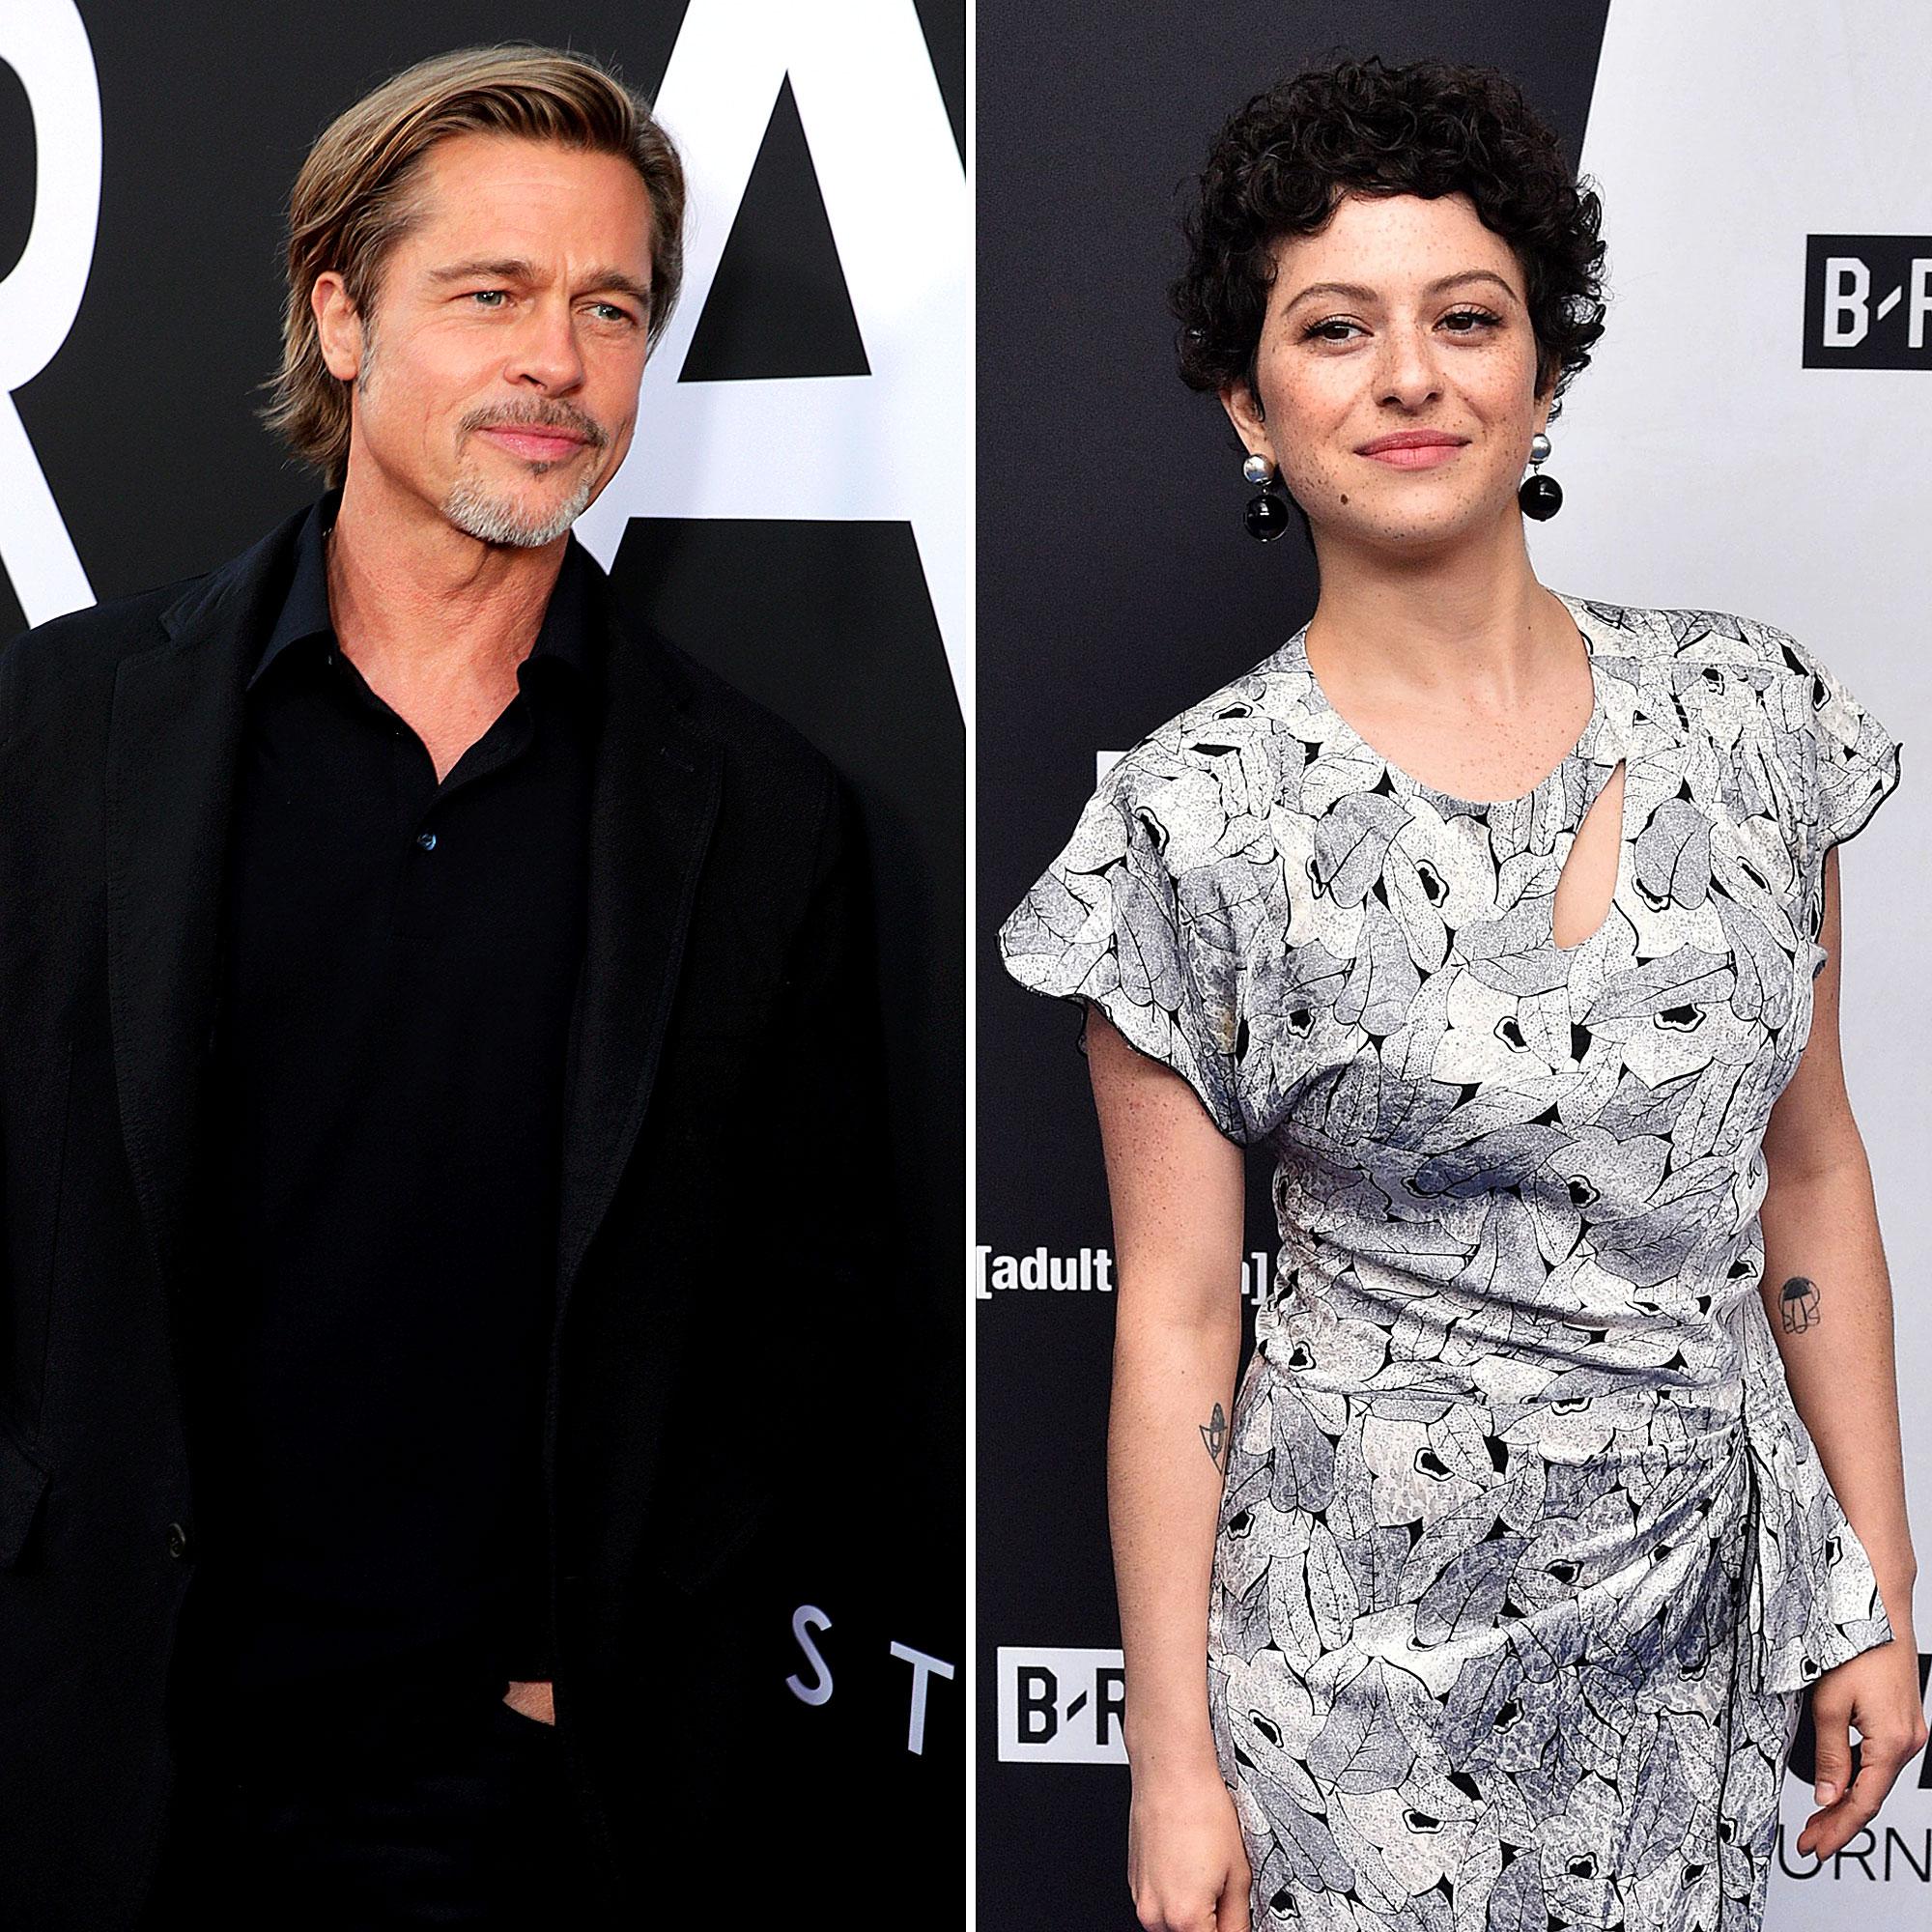 Inside Brad Pitt and Alia Shawkat's 'Organic and Easy' Friendship